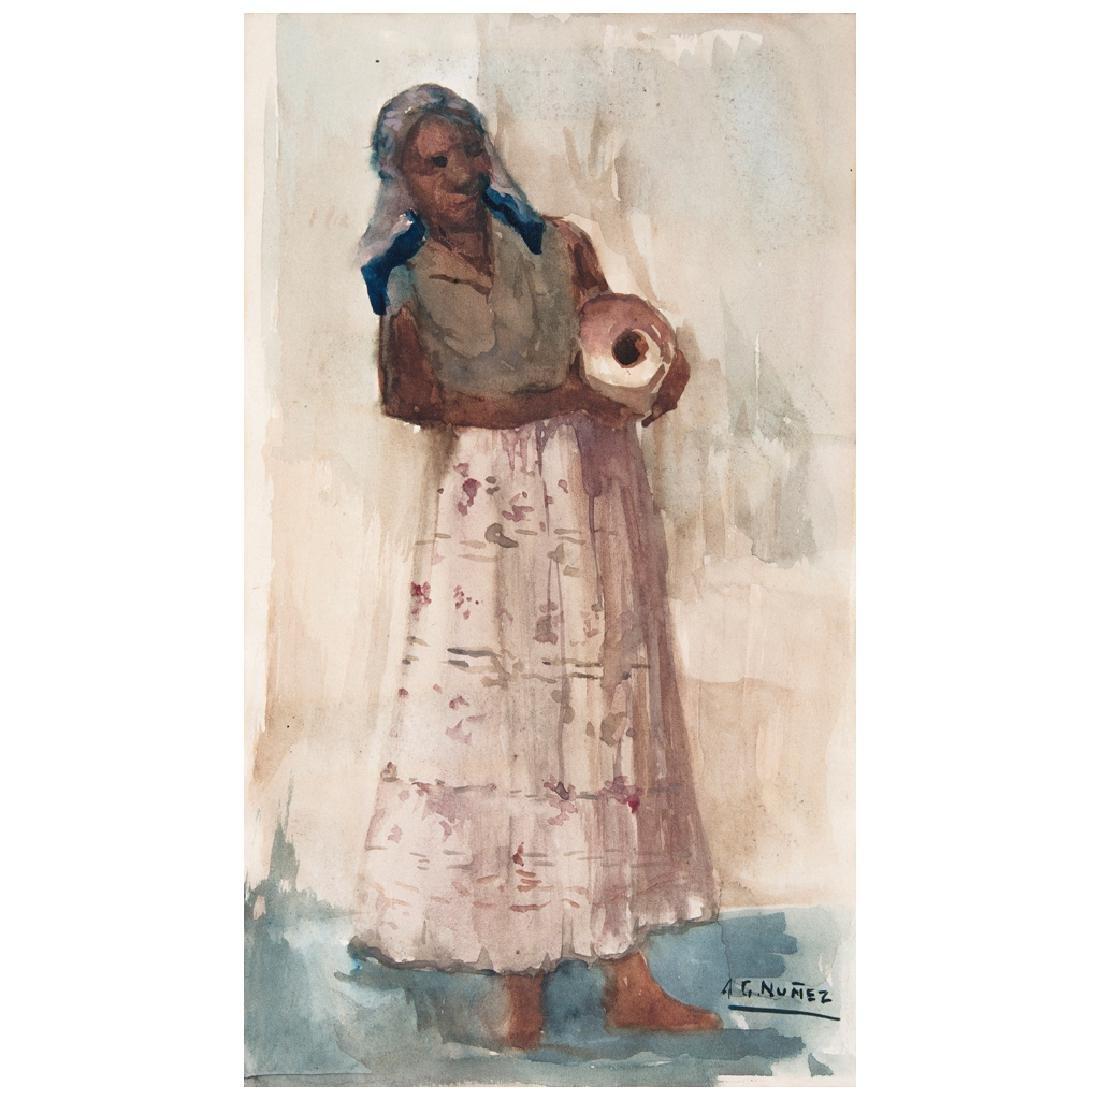 ARMANDO GARCiA NuNEZ, Untitled, Signed, Watercolor on